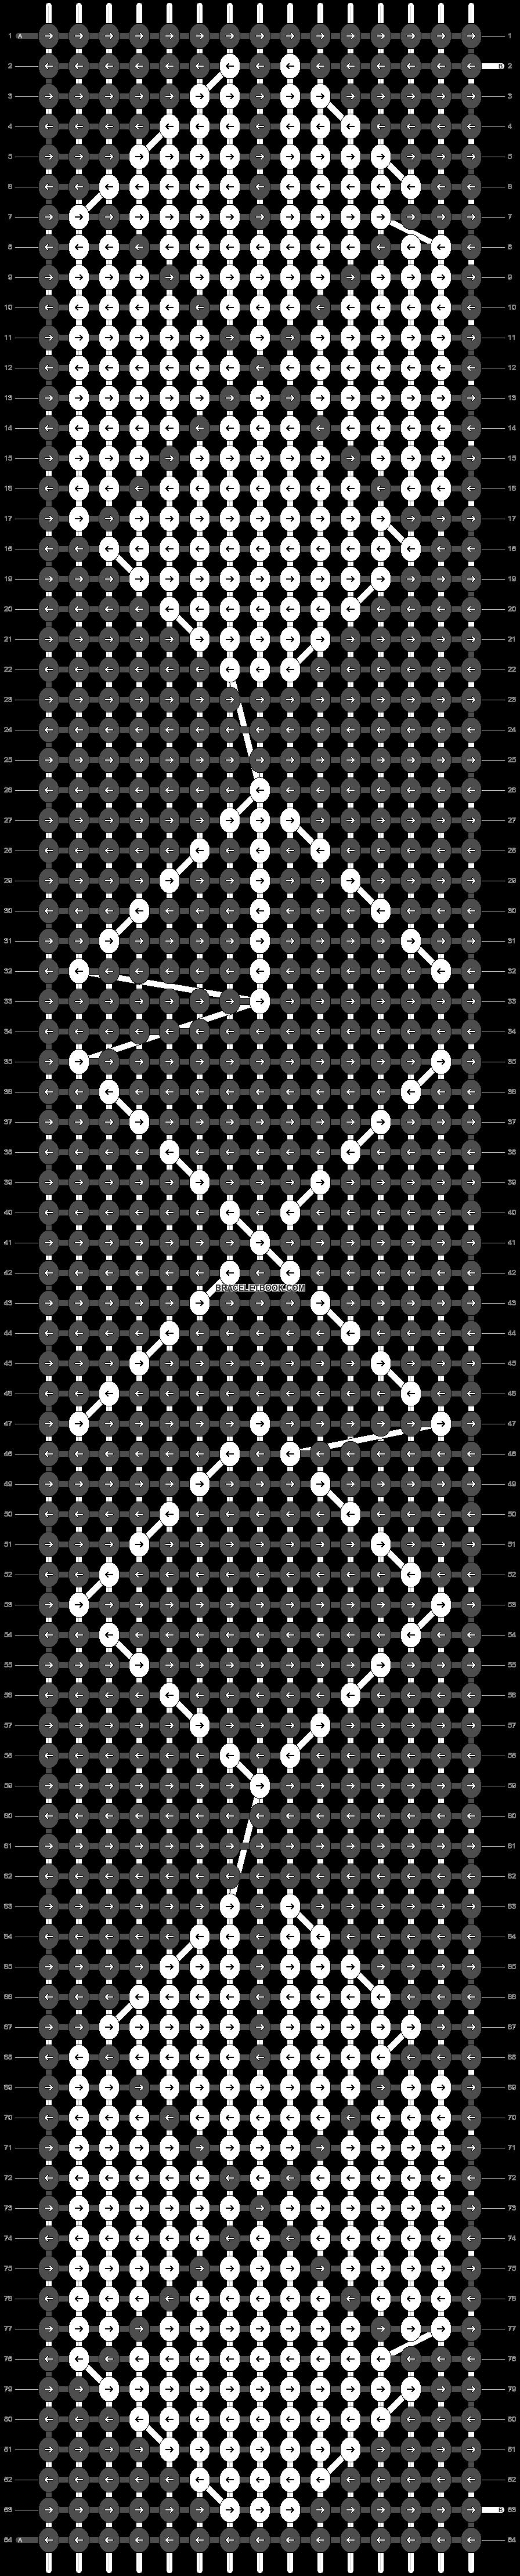 Alpha pattern #18186 pattern